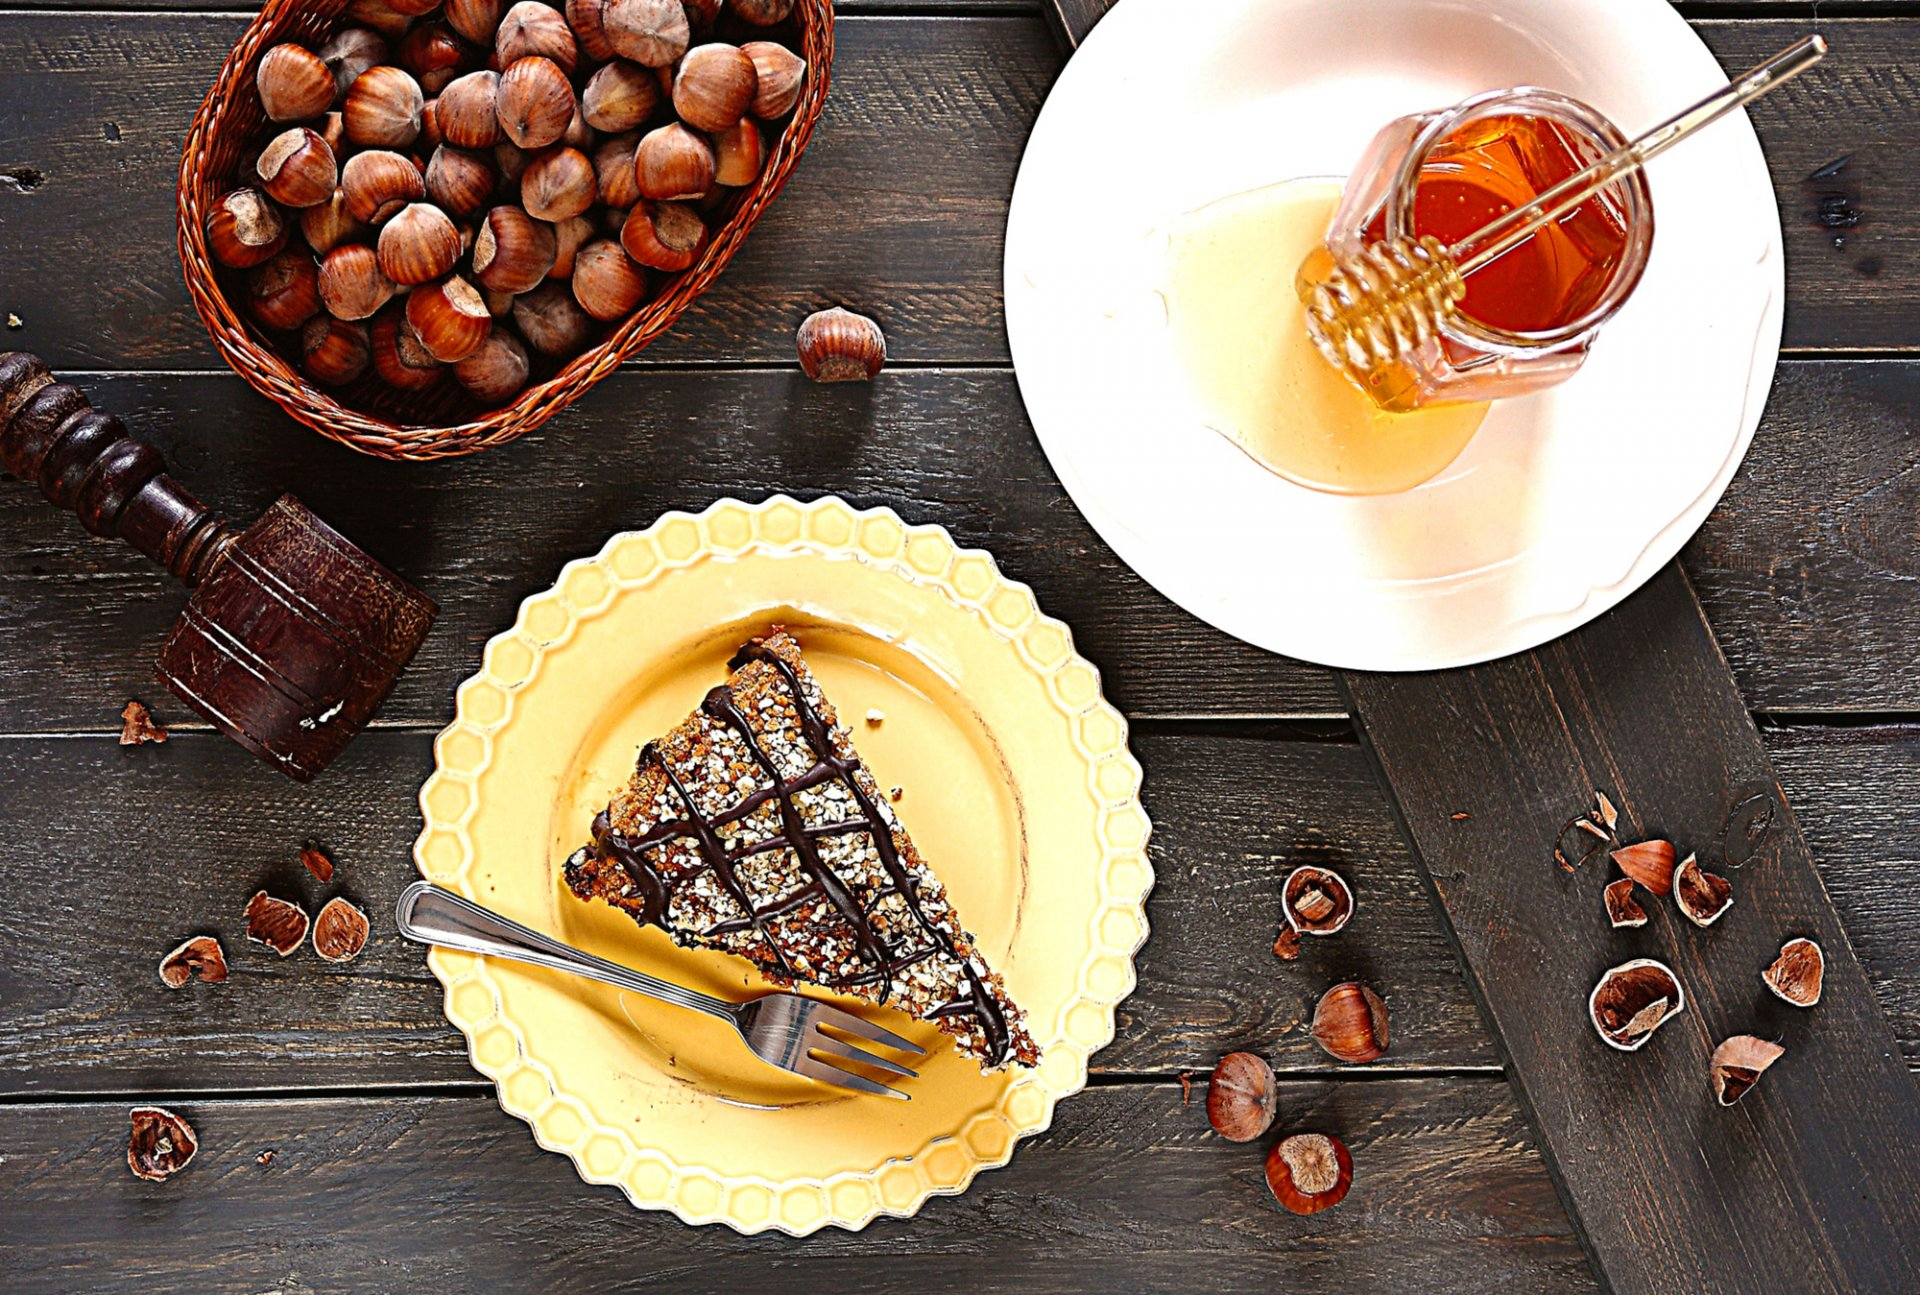 Обои пирожное, орехи, шоколад, крем. Еда foto 19